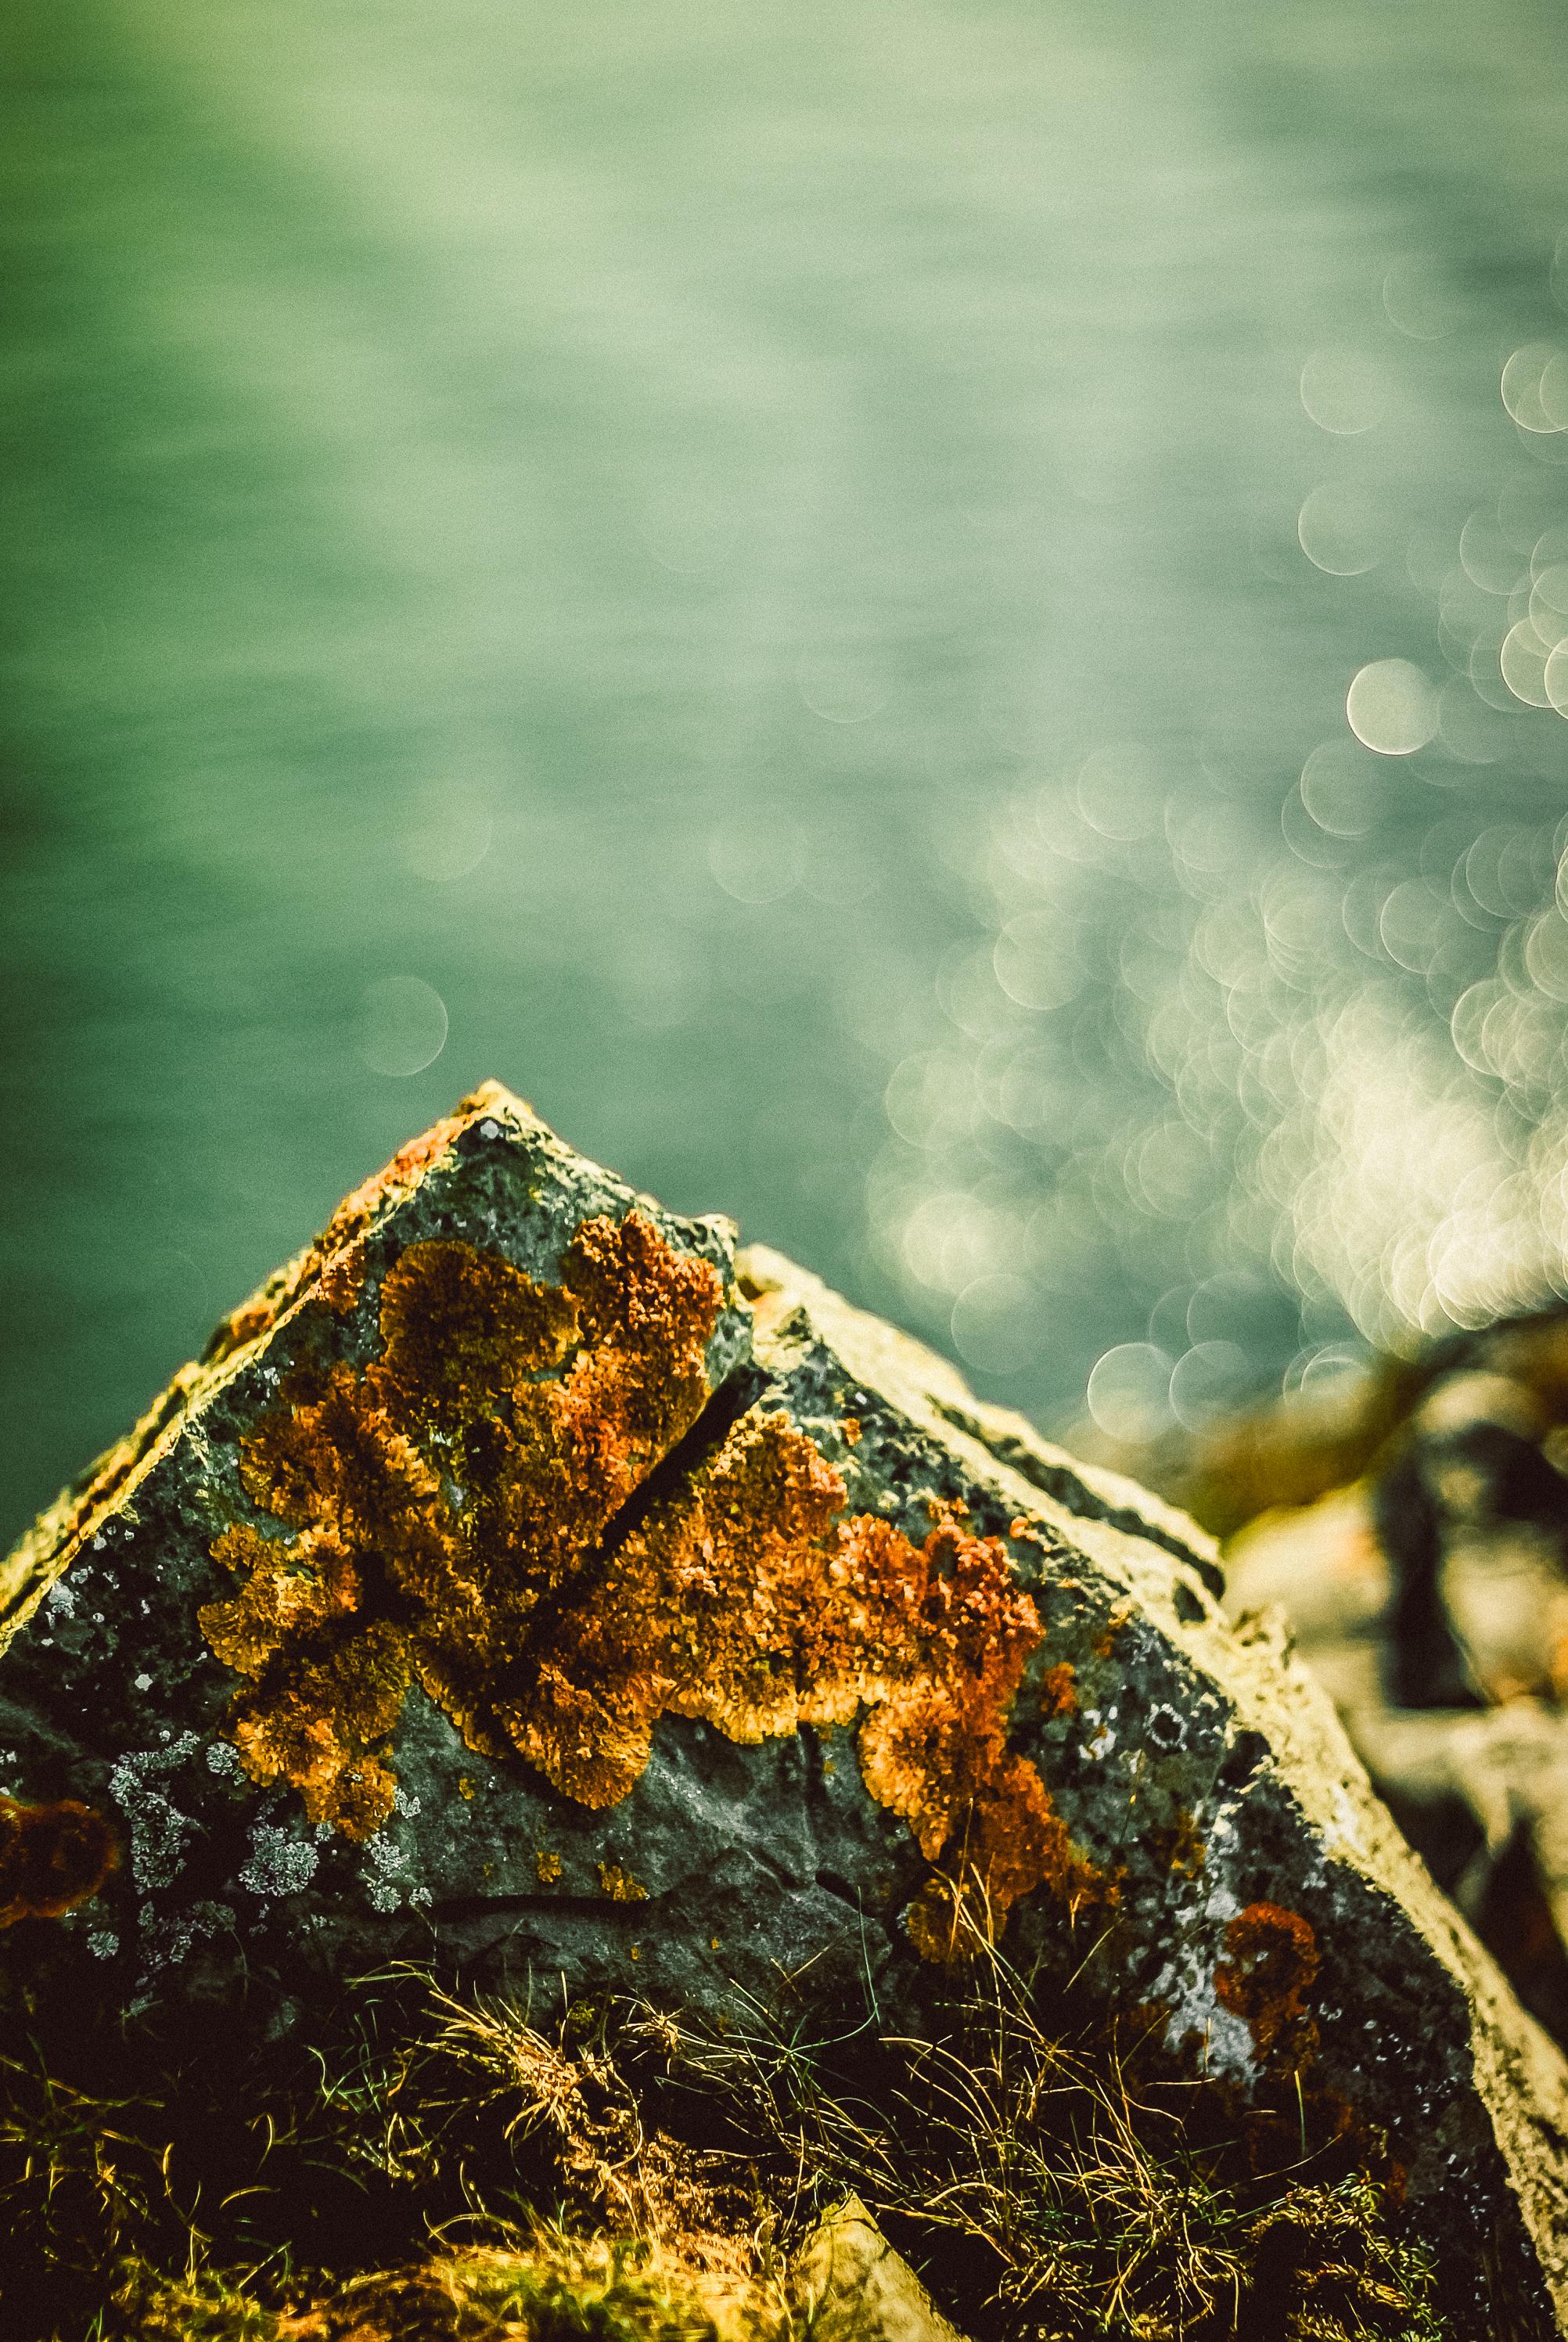 Rock, Tenby.  Nikon D60 | 50mm | F1.8 - 1/4000th - iso100